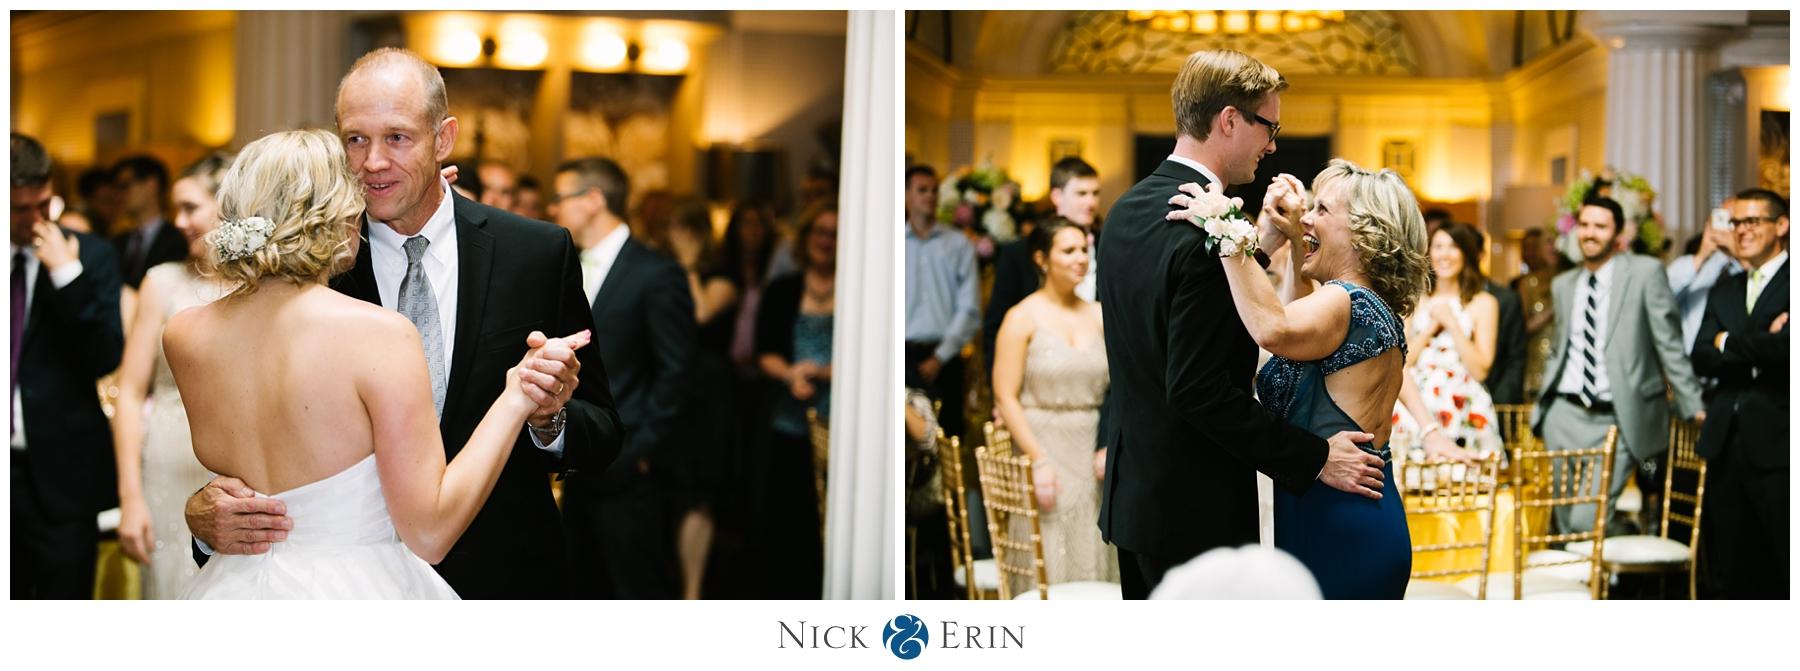 Donner_Photography_Washington DC Wedding_Rachel & Taylor_0055